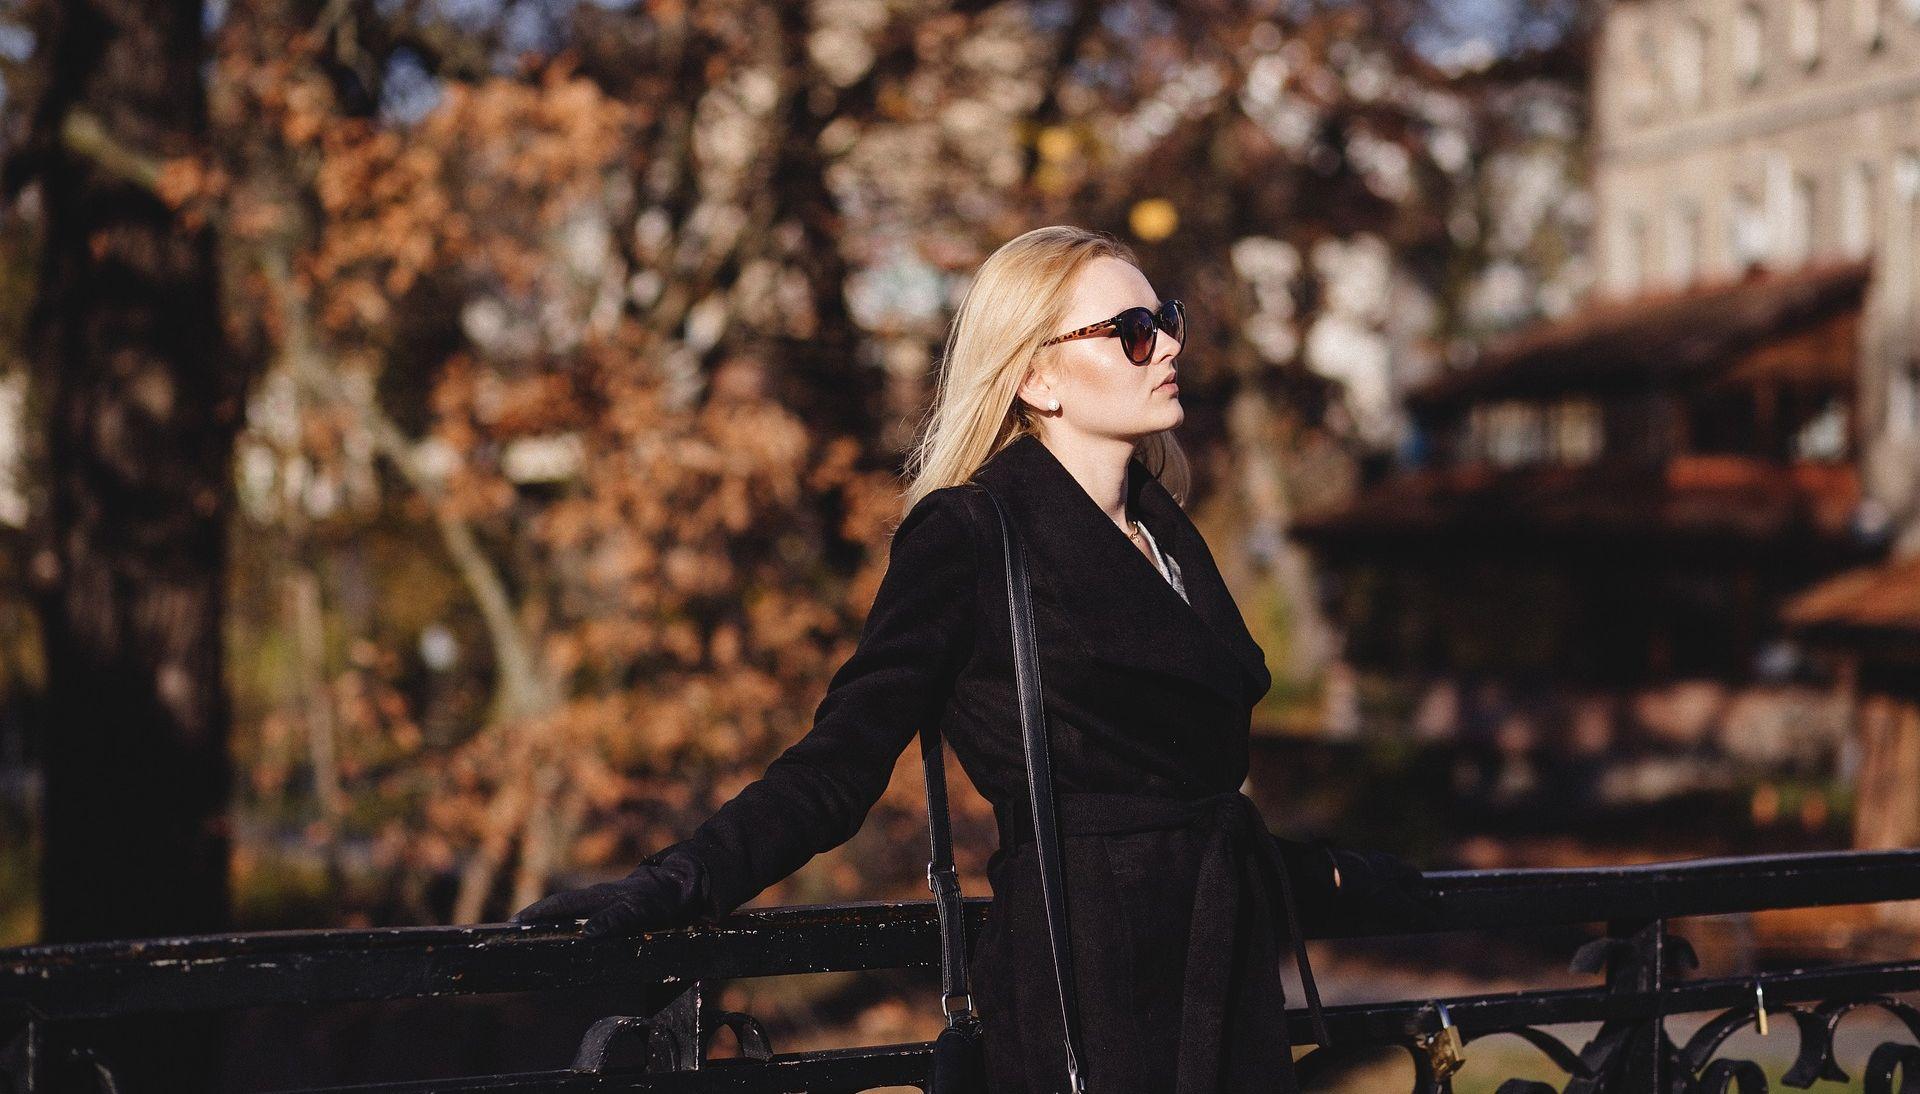 Sunčan prvi dan listopada uz ugodne dnevne temperature